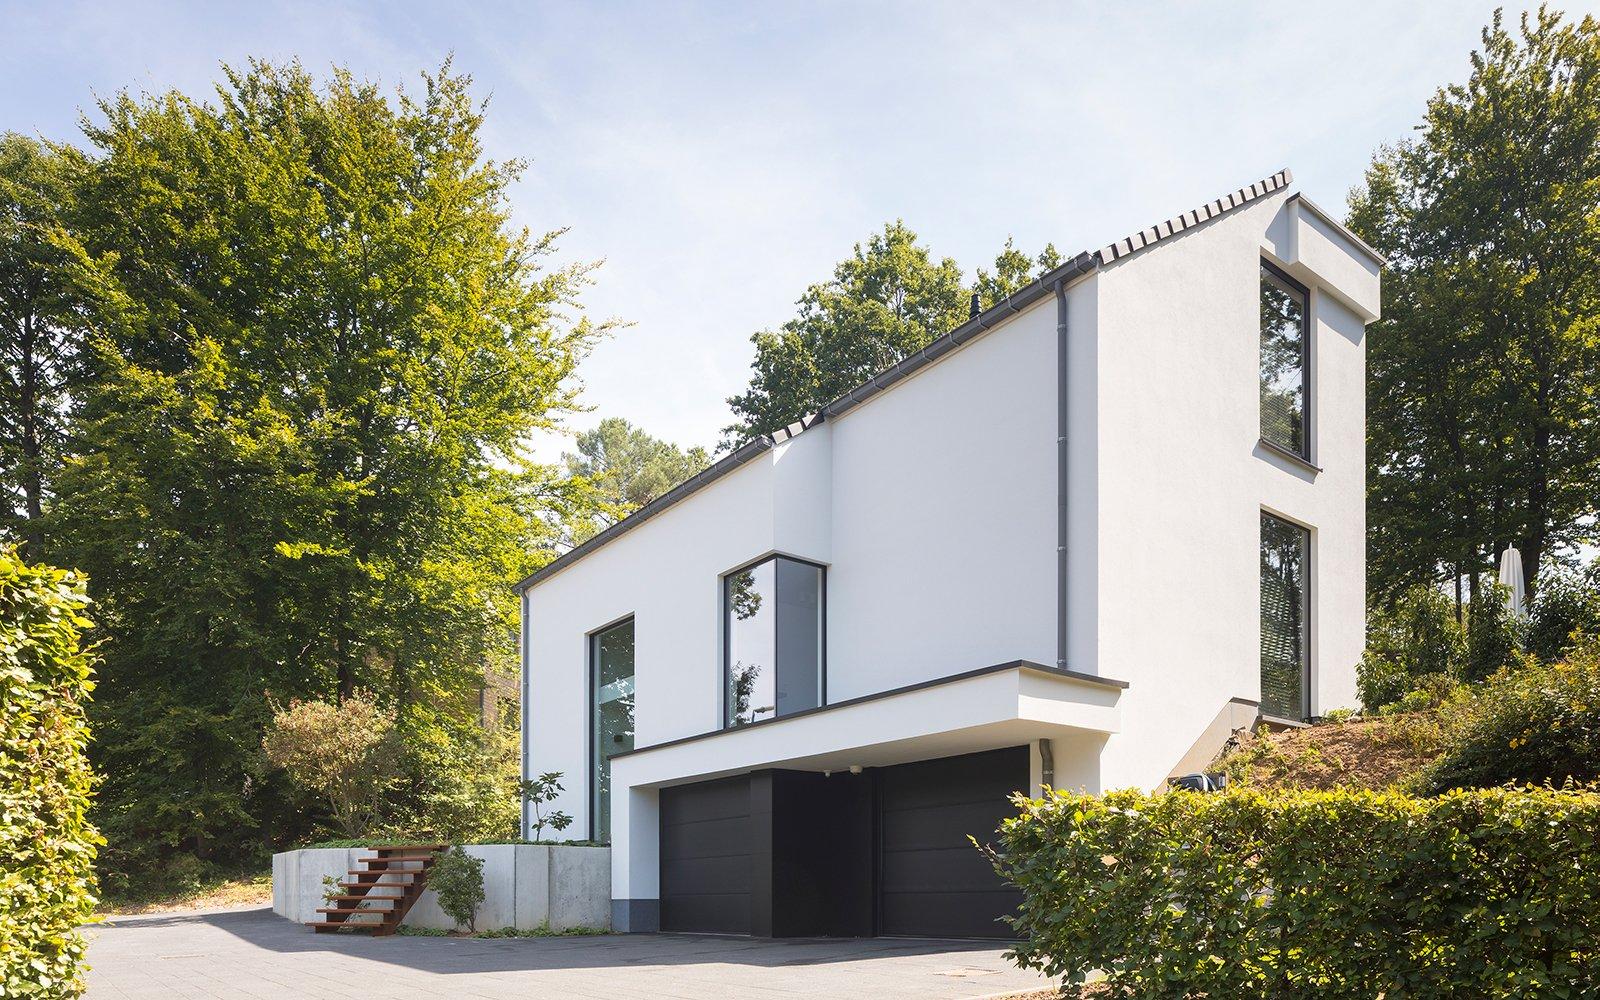 Transformatie, renovatie, magnus villas